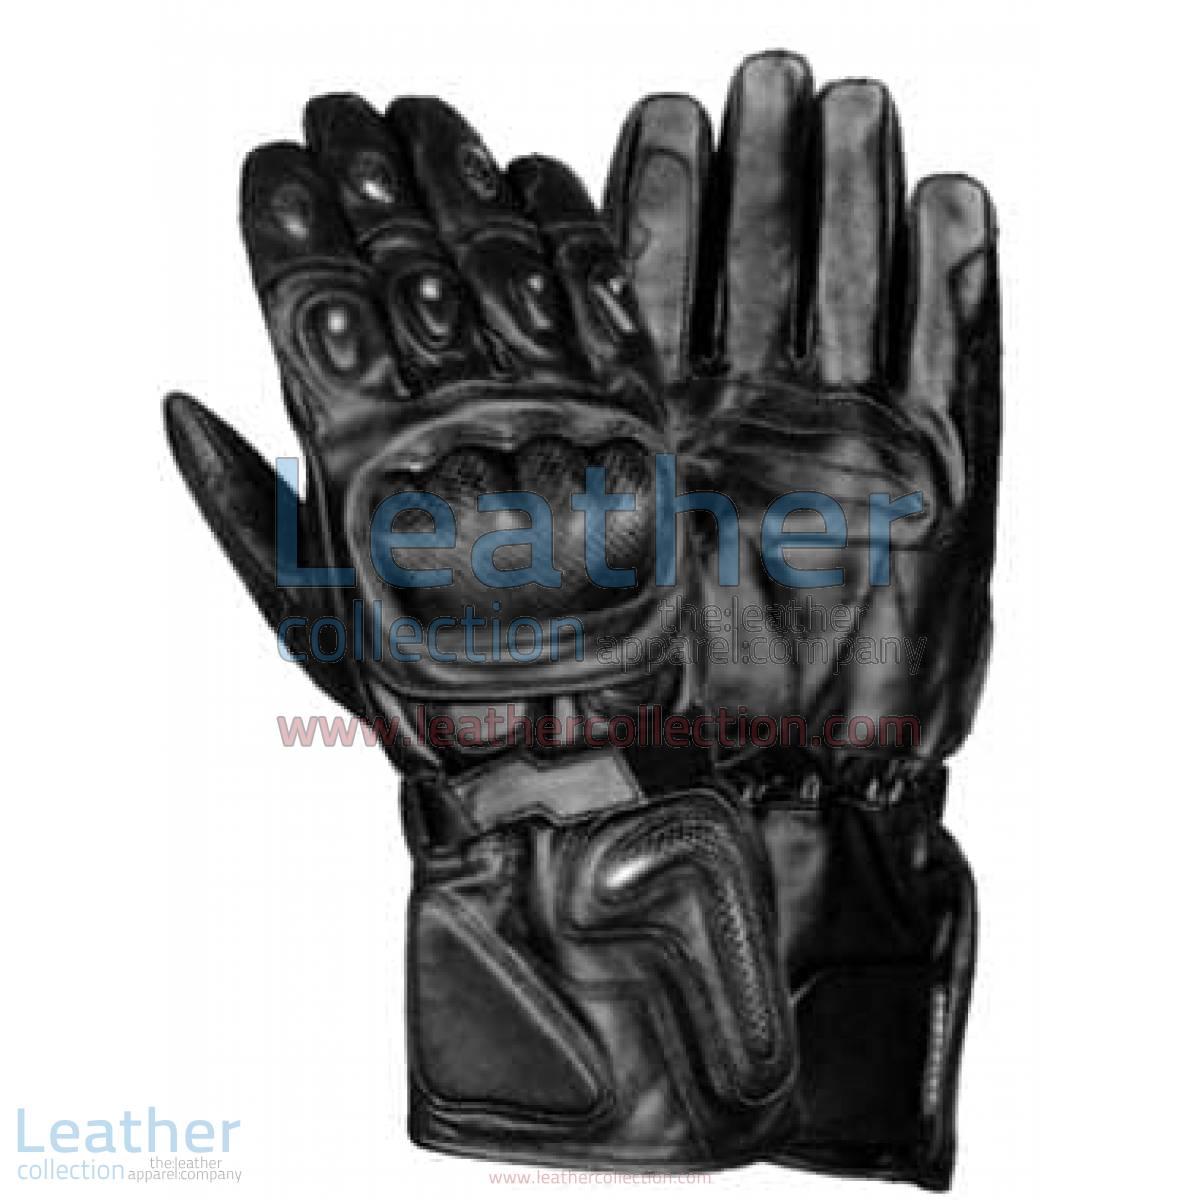 Silverstone Motorbike Riding Gloves